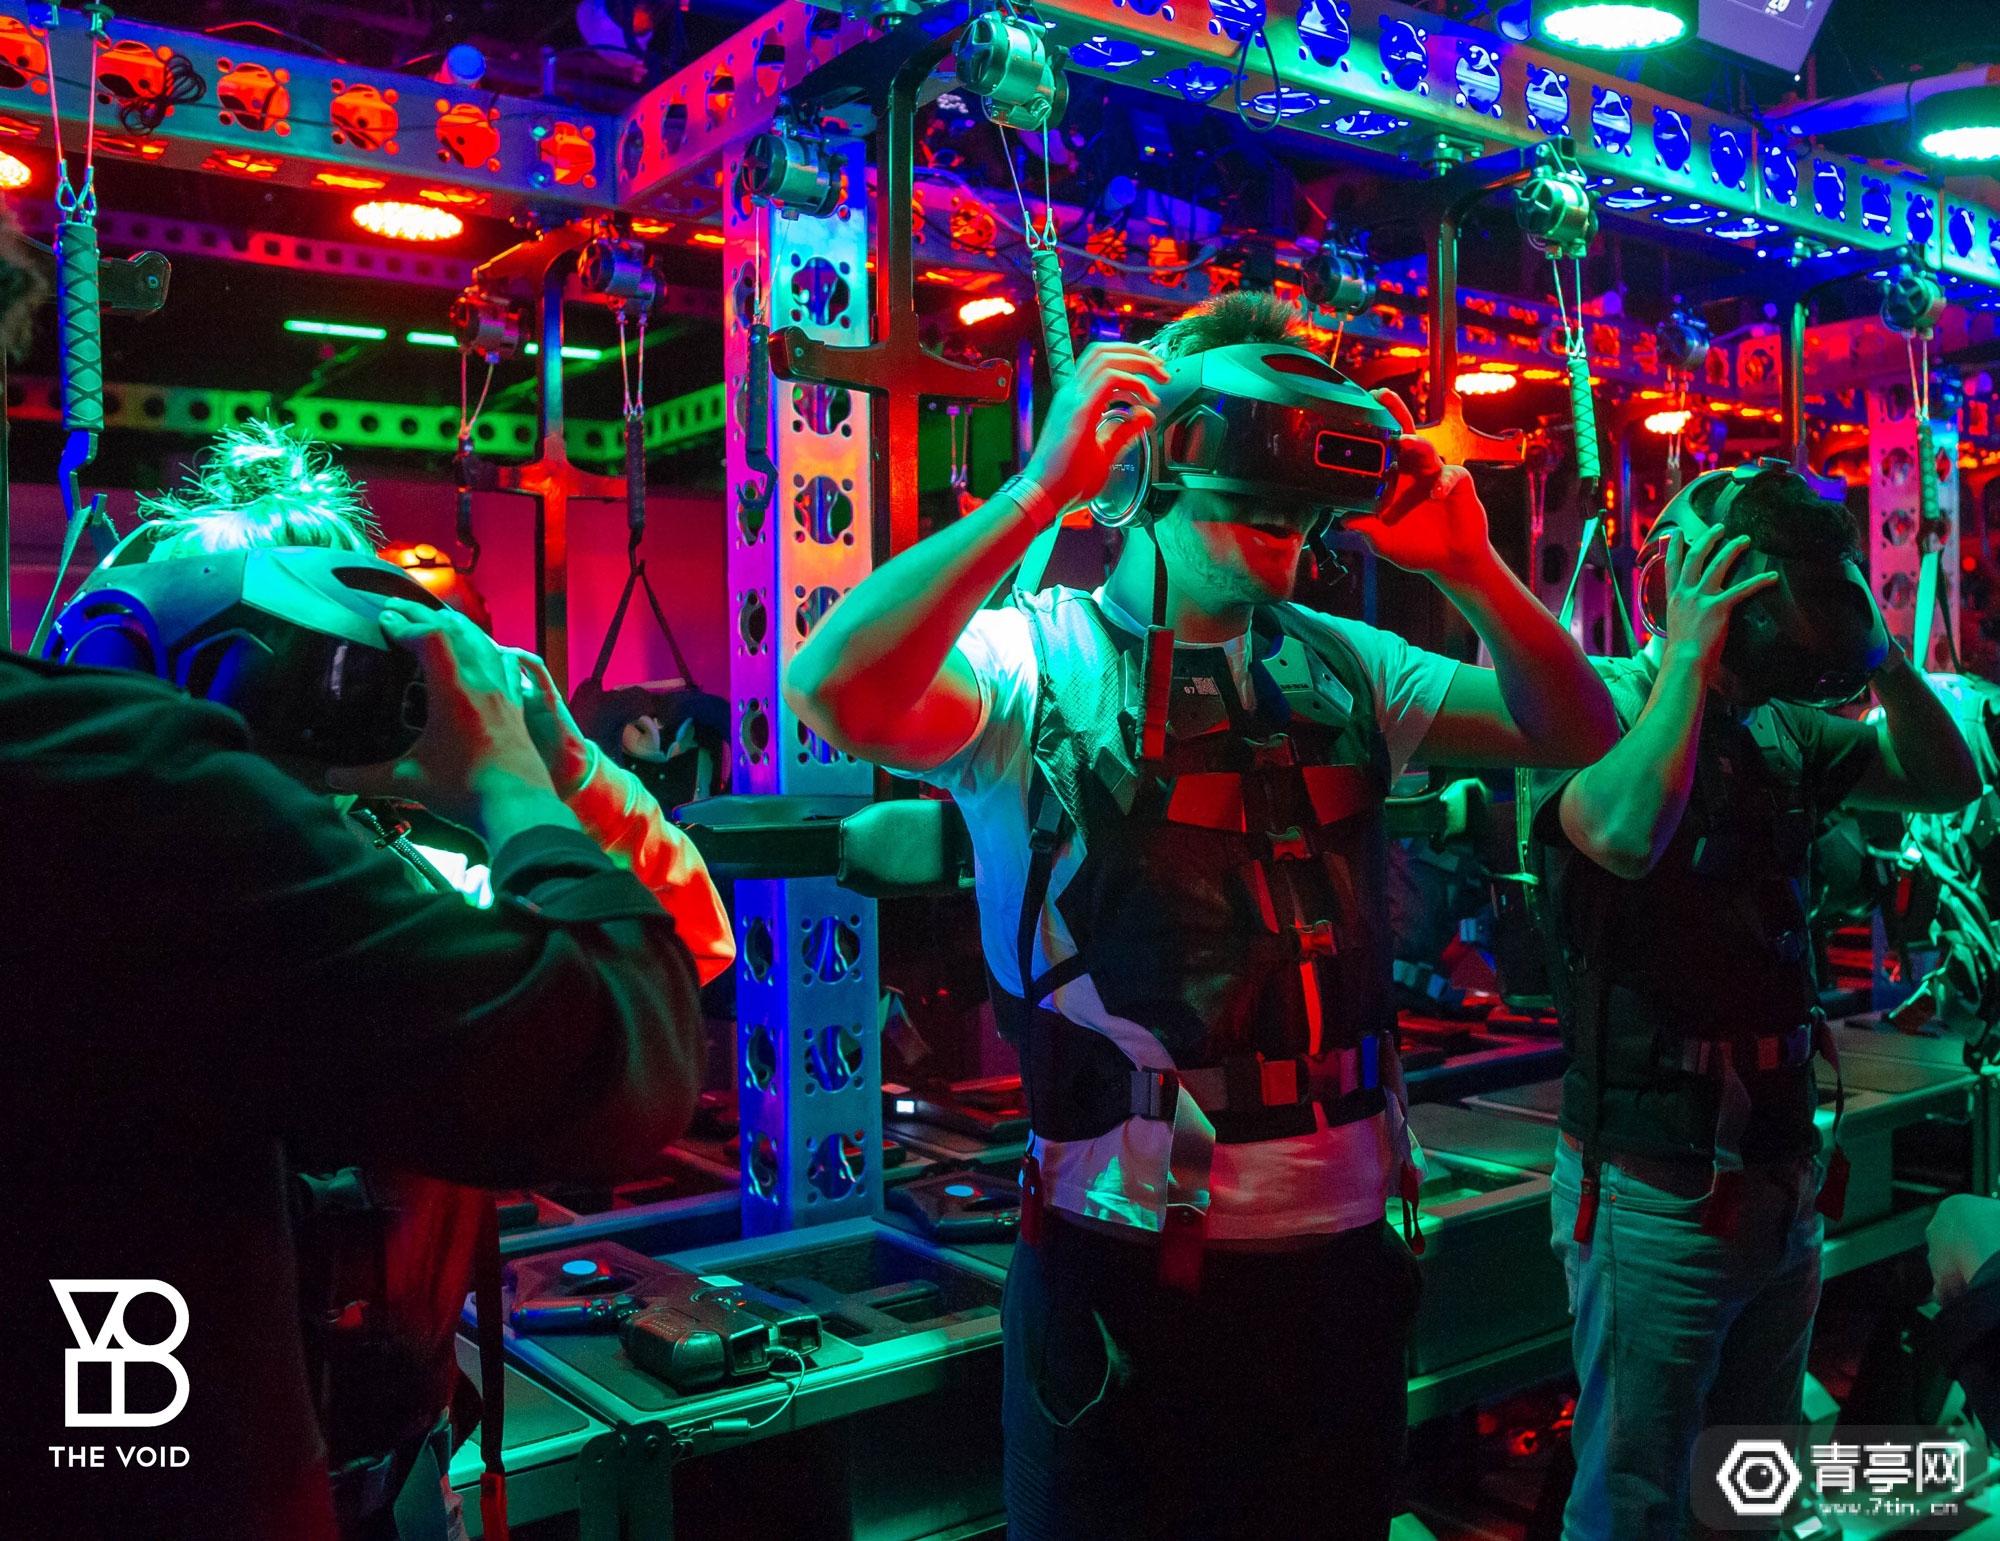 The VOID将新增三家线下VR体验店,布局扩张将持续到2020年